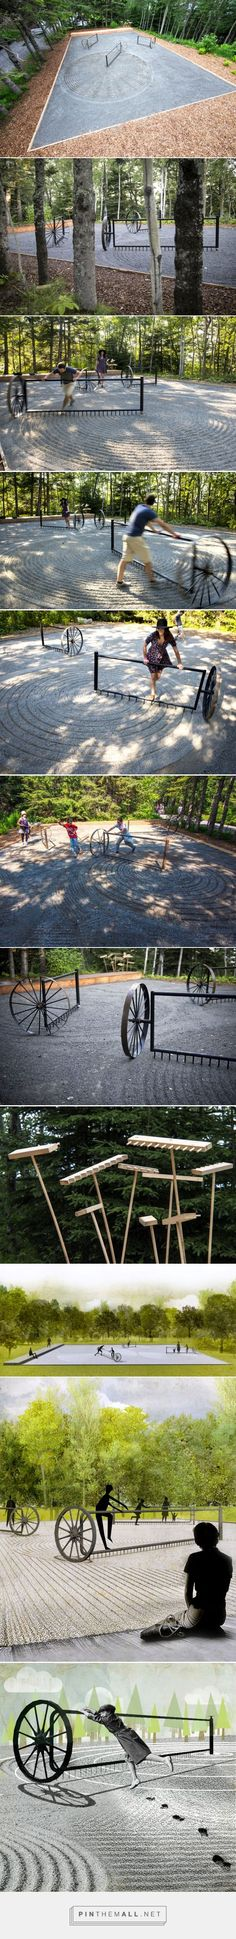 talmon biran architecture composes interactive zen garden - created via http://pinthemall.net